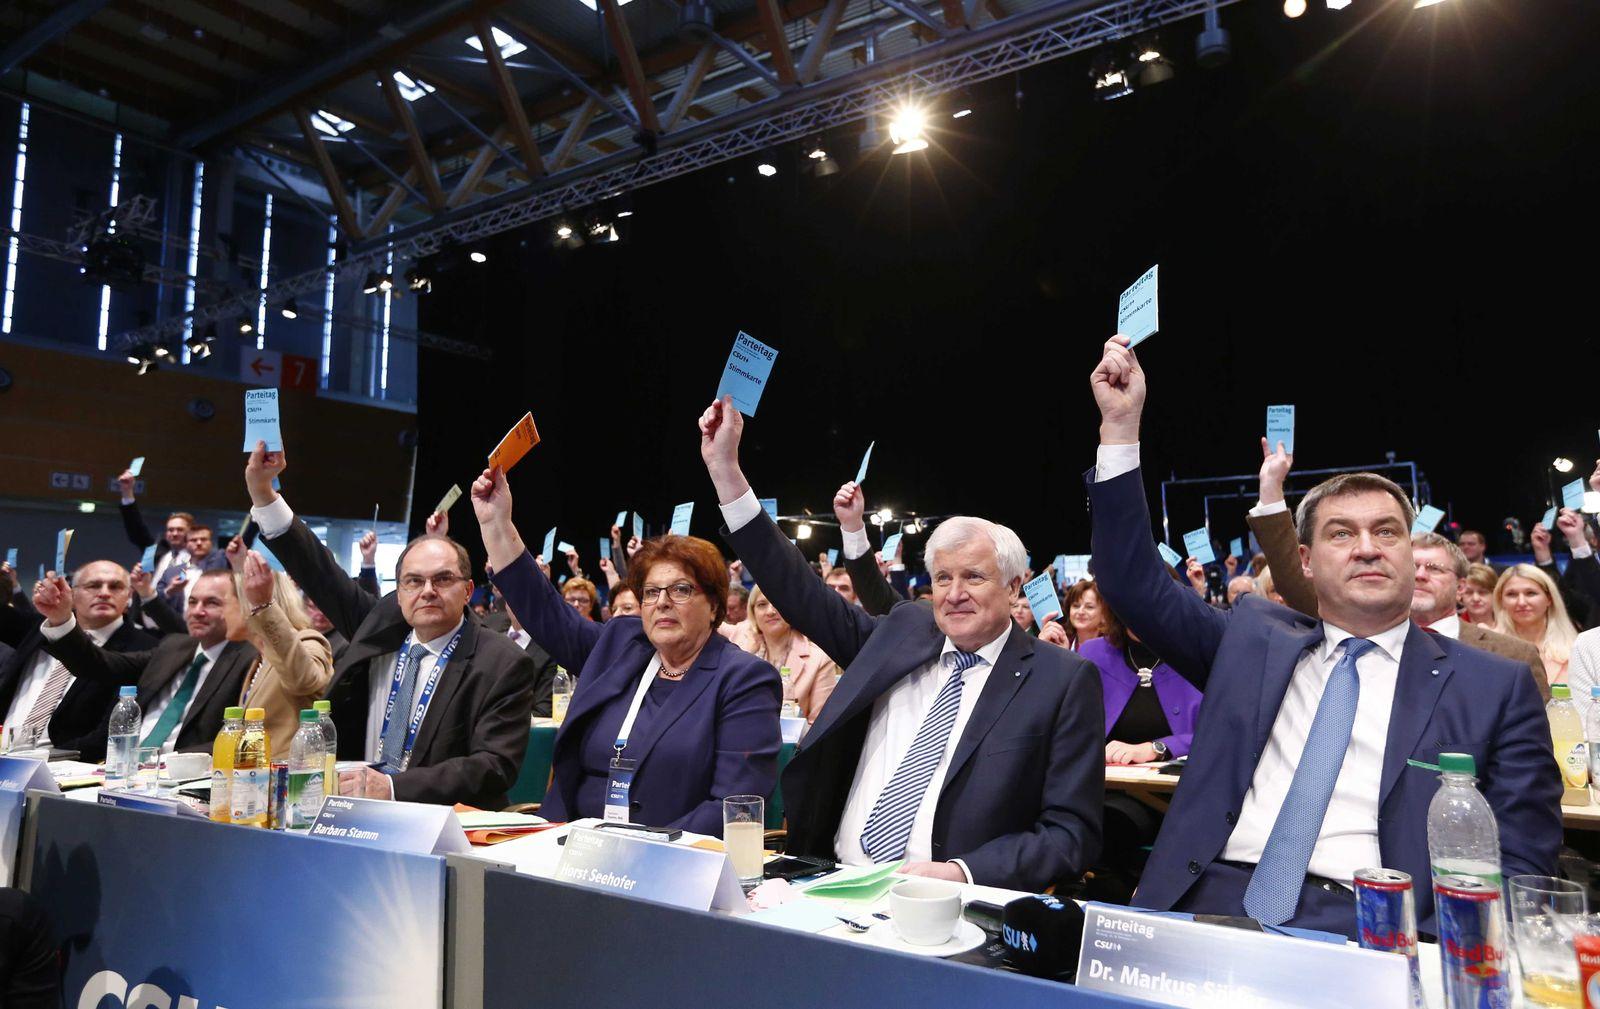 CSU Parteitag/ Söder/ Seehofer